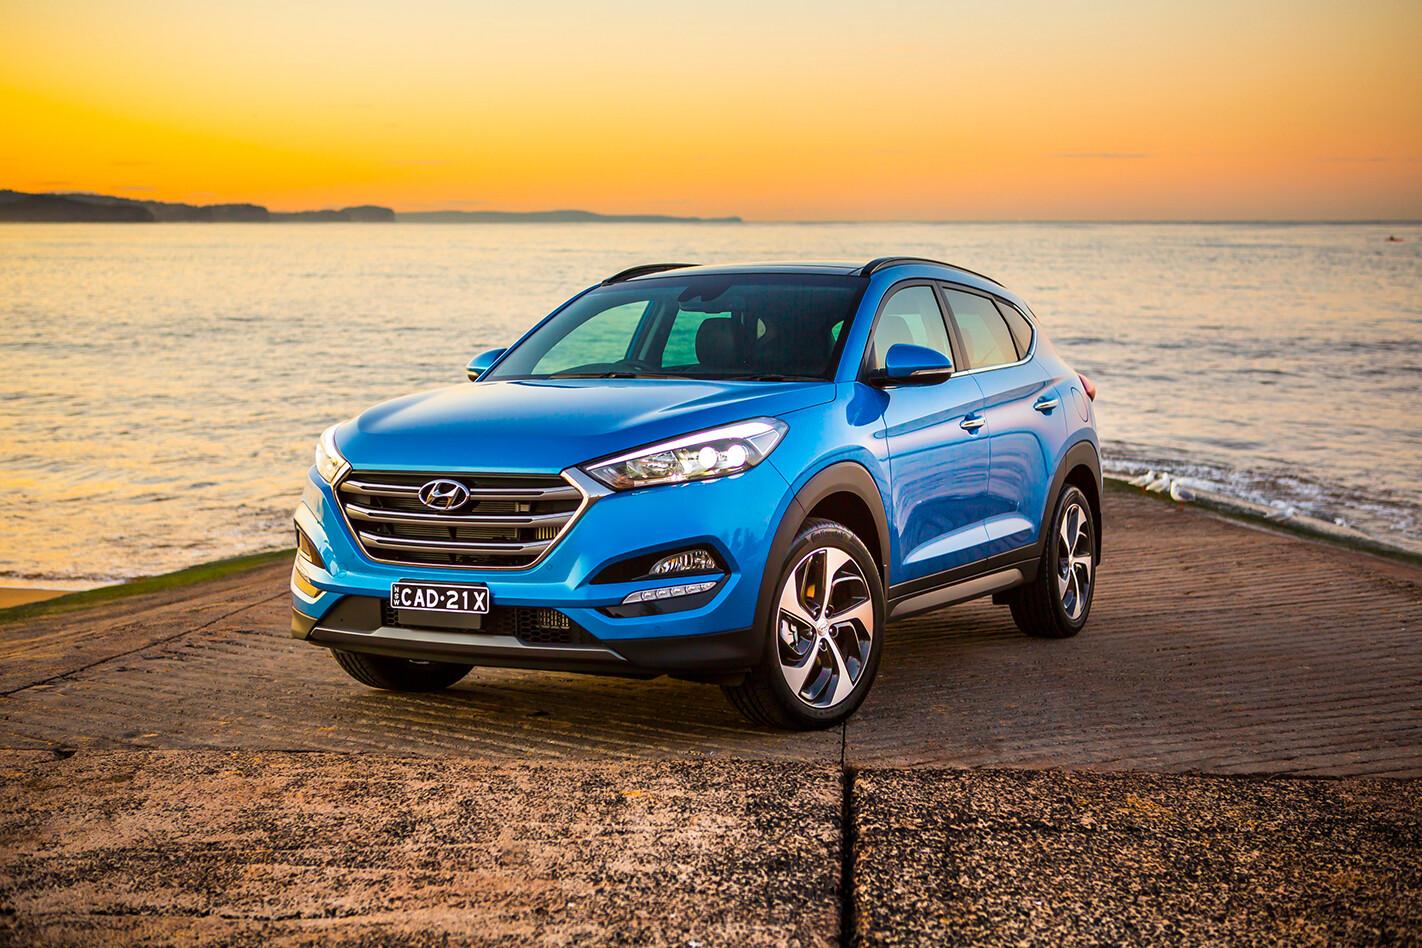 2015 Hyundai Tucson review